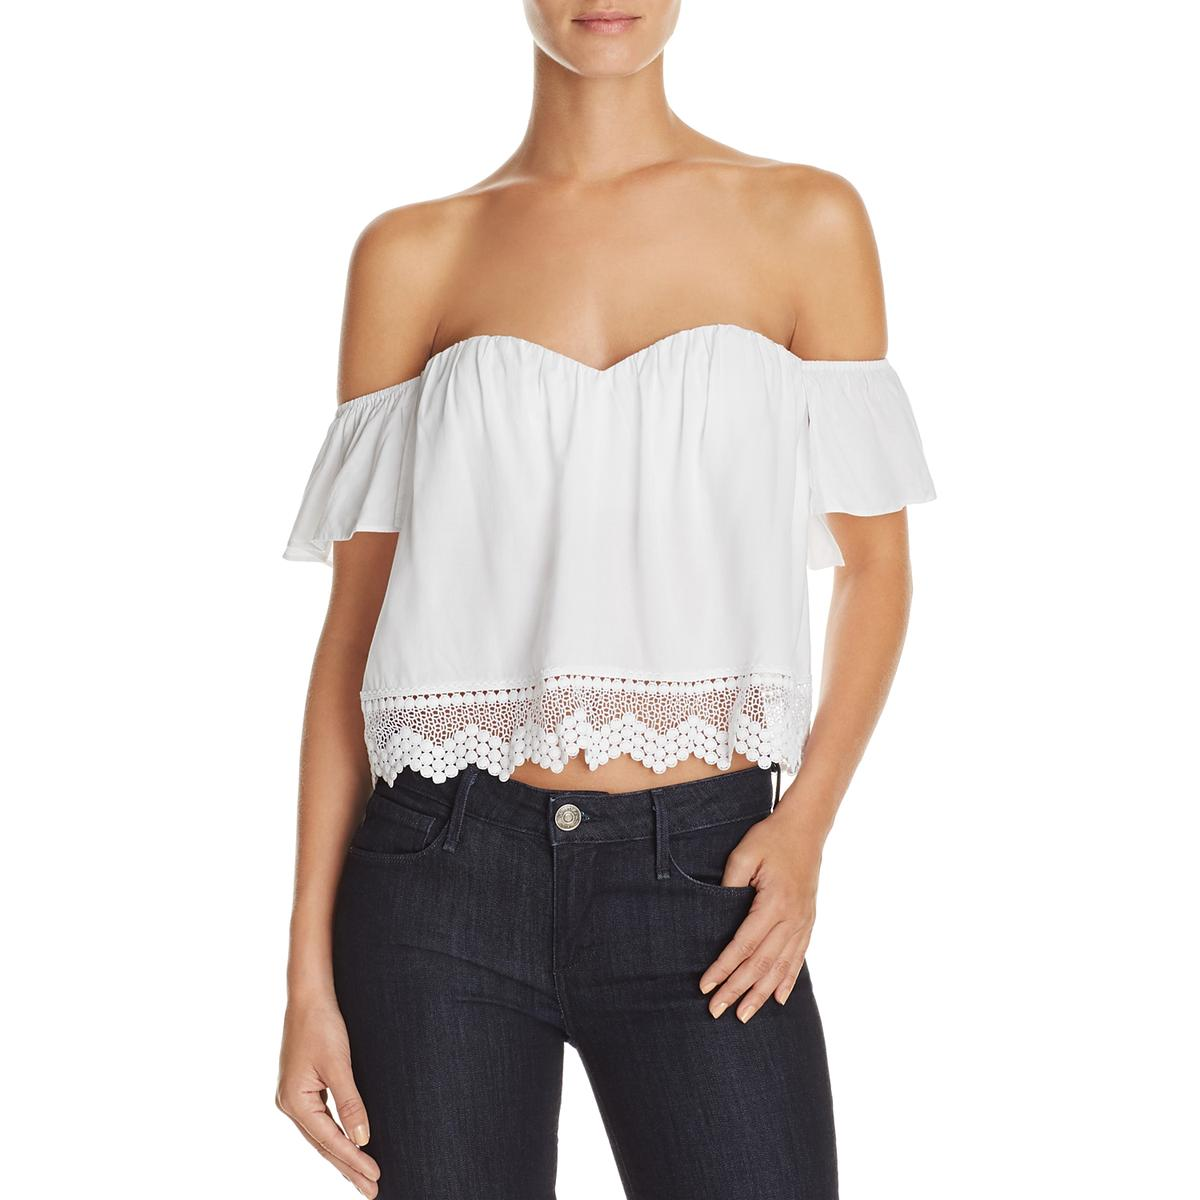 4c721444 Cotton Candy Womens White Crochet Trim Ruffled Crop Top Blouse L ...